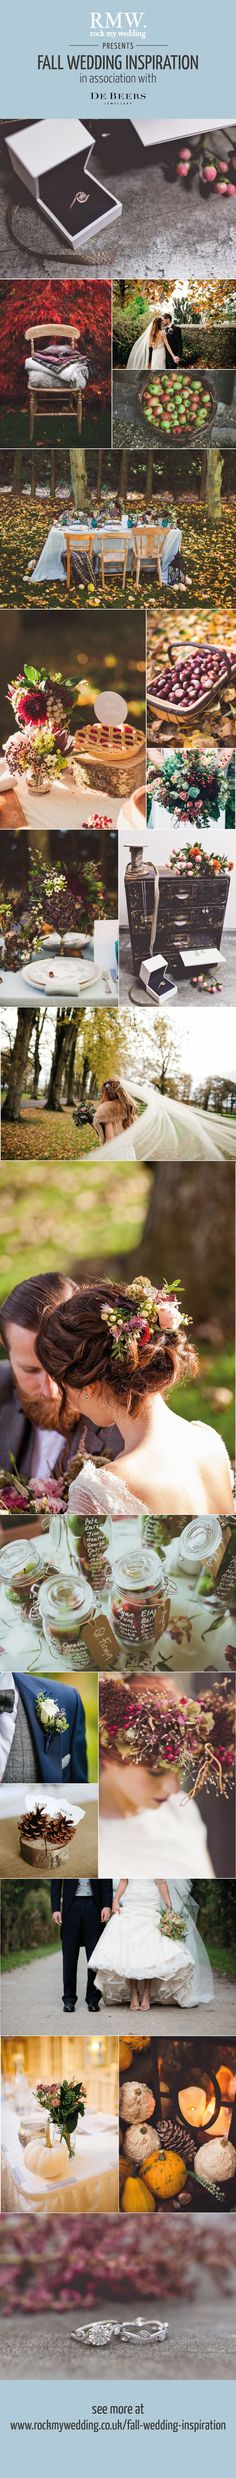 Fall And Autumn Wedding Styling Ideas | http://www.rockmywedding.co.uk/fall-wedding-inspiration/